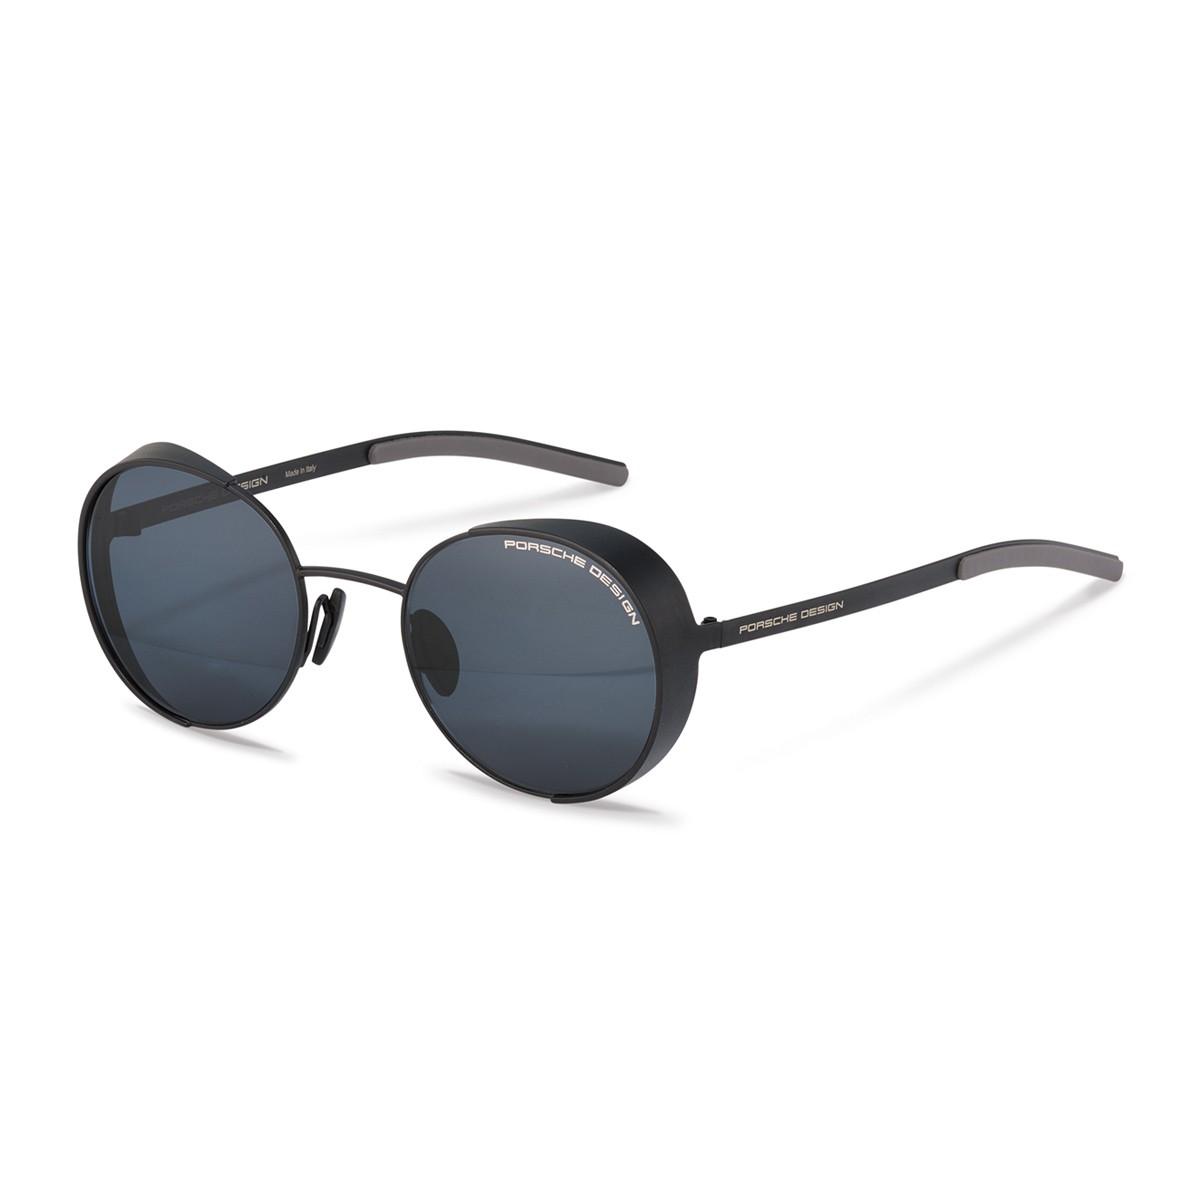 Porsche Design P8674   Men's sunglasses